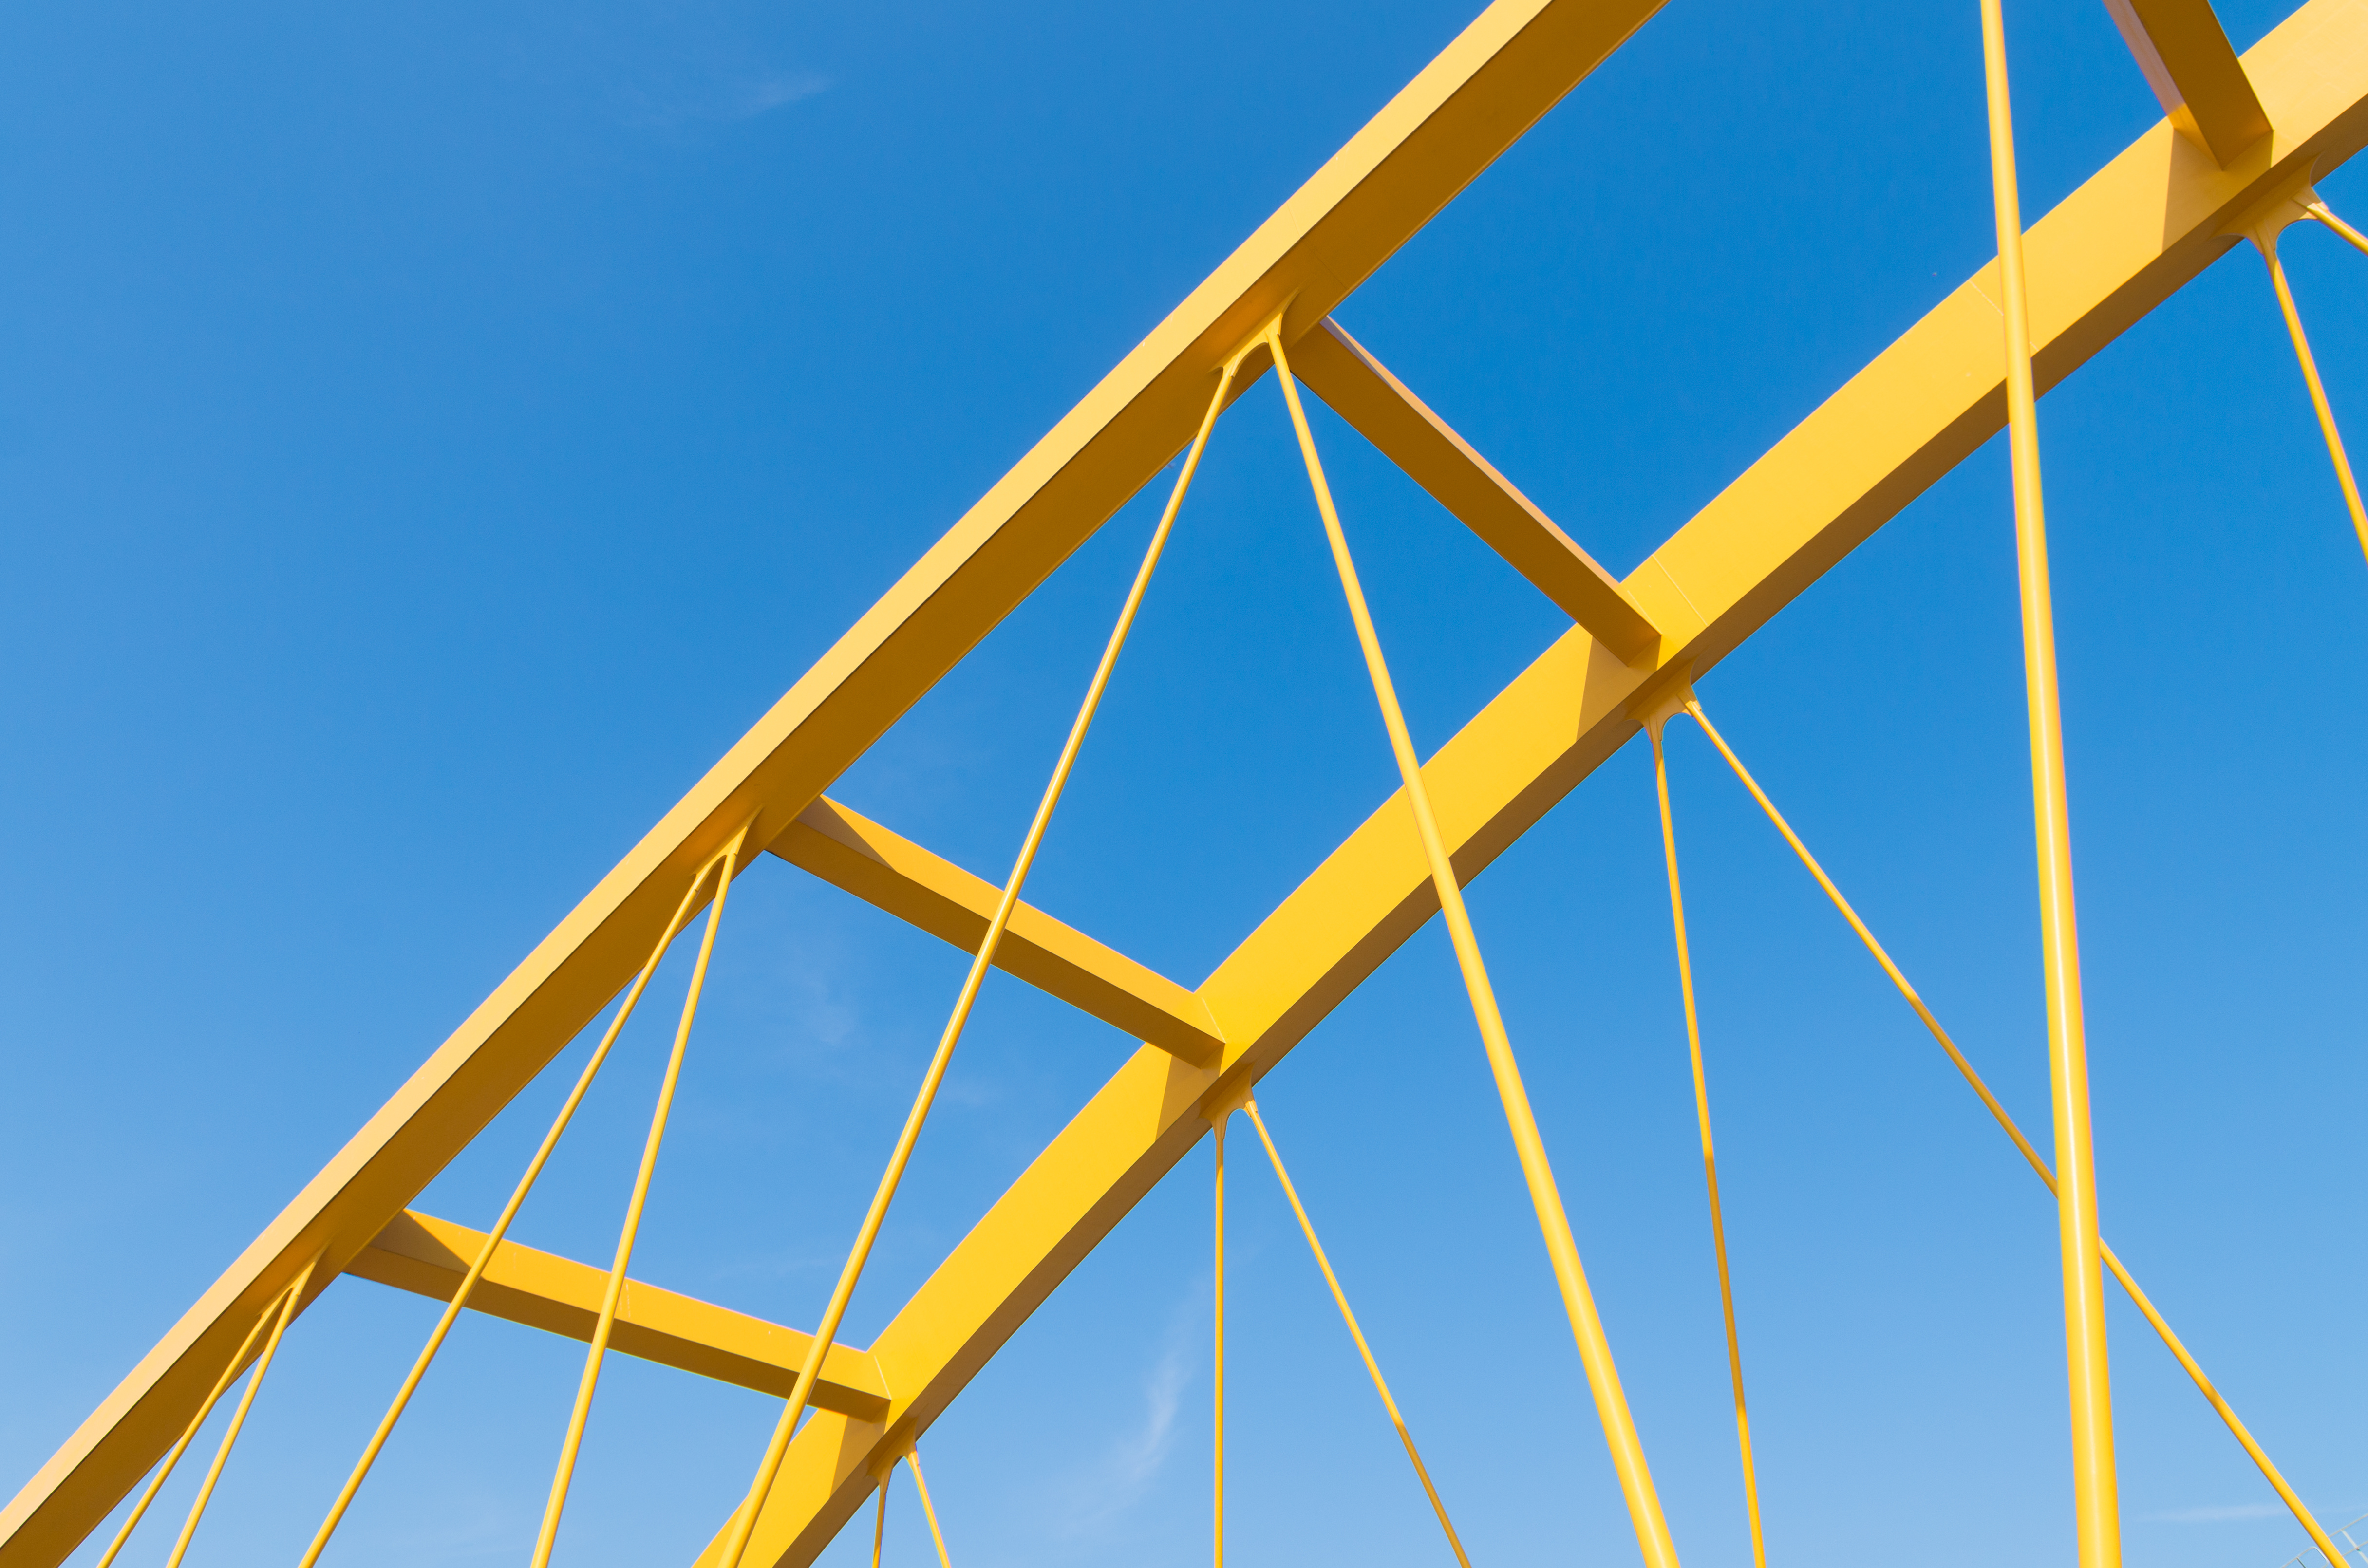 Close up shot of yellow bridge